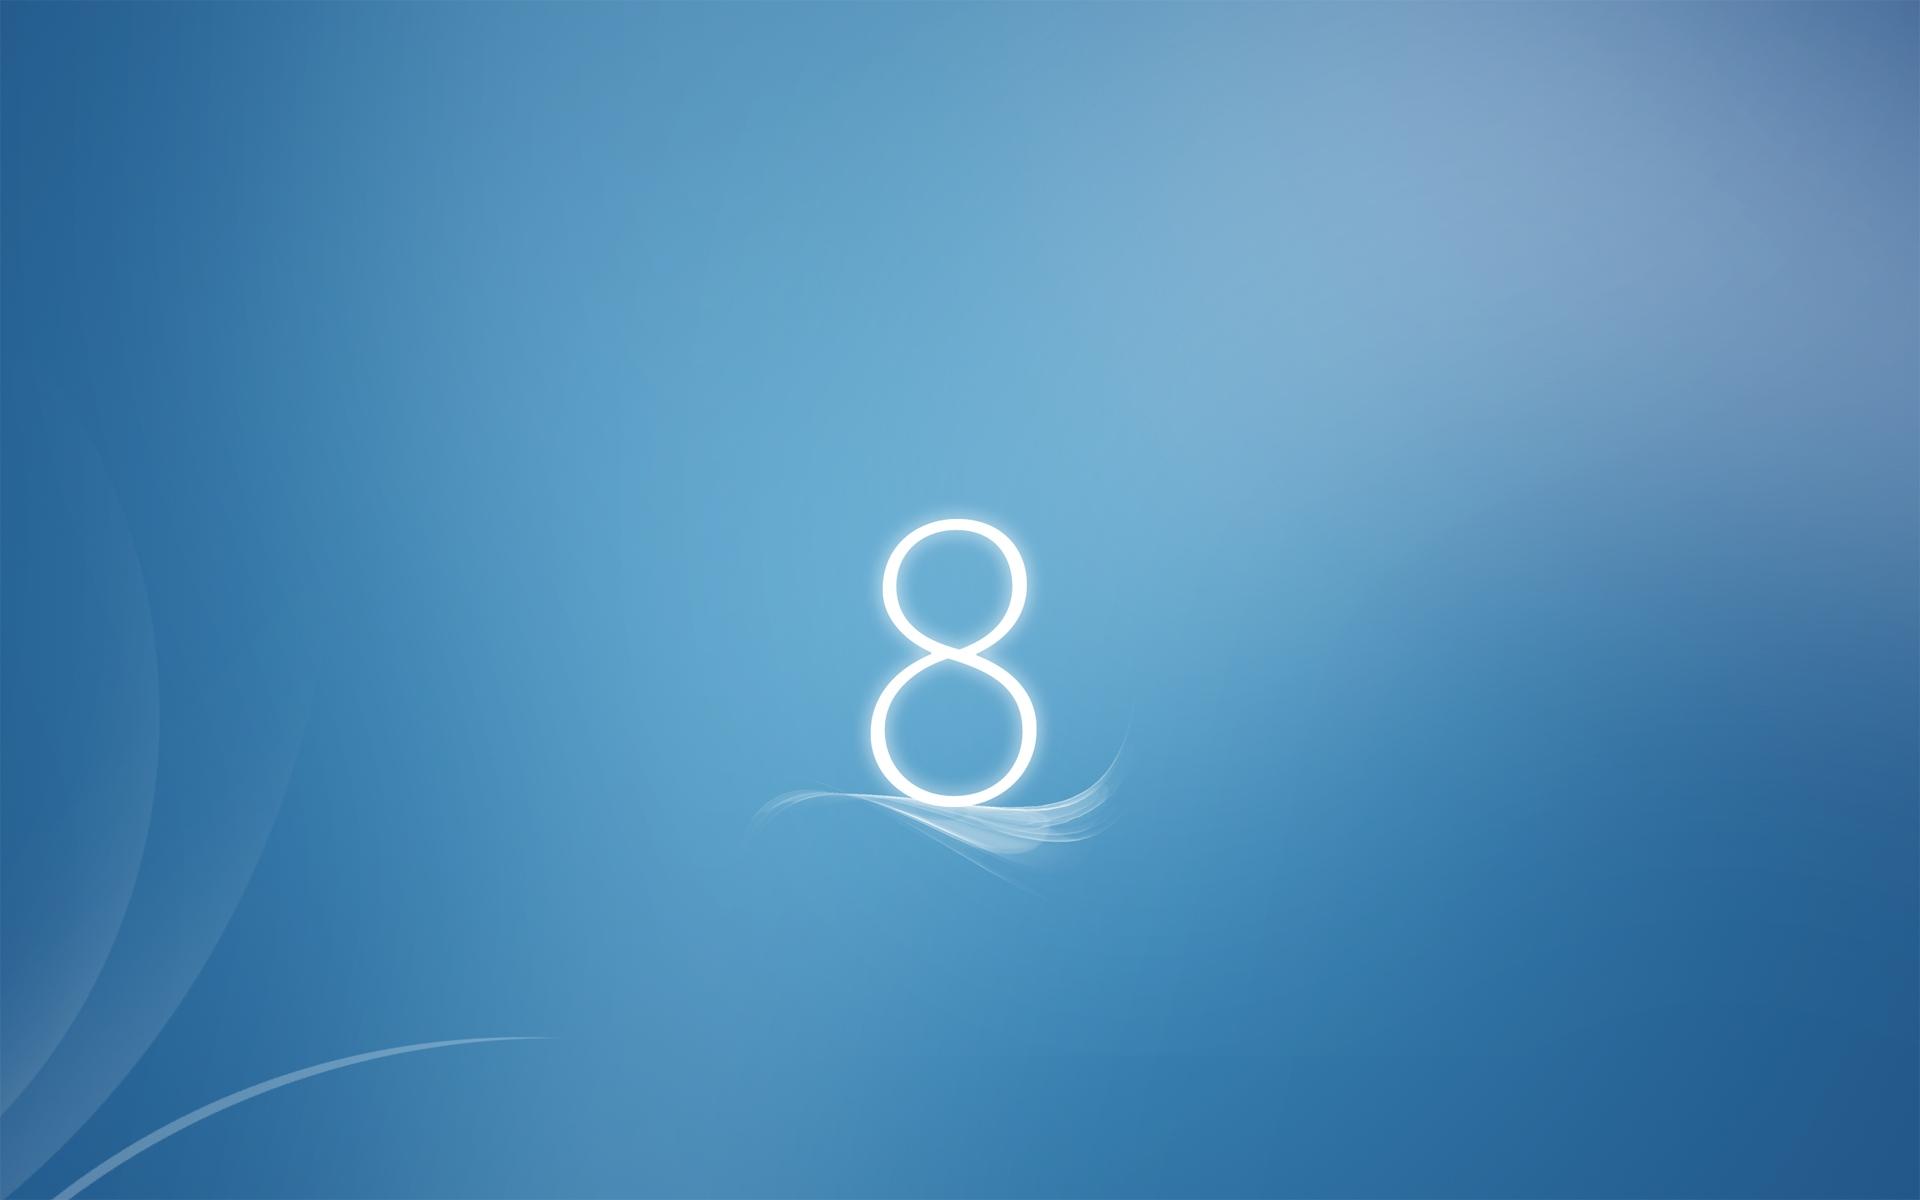 Best Wallpaper High Quality Windows 8 - windows-8-wallpaper-2452  Gallery_69532.jpg